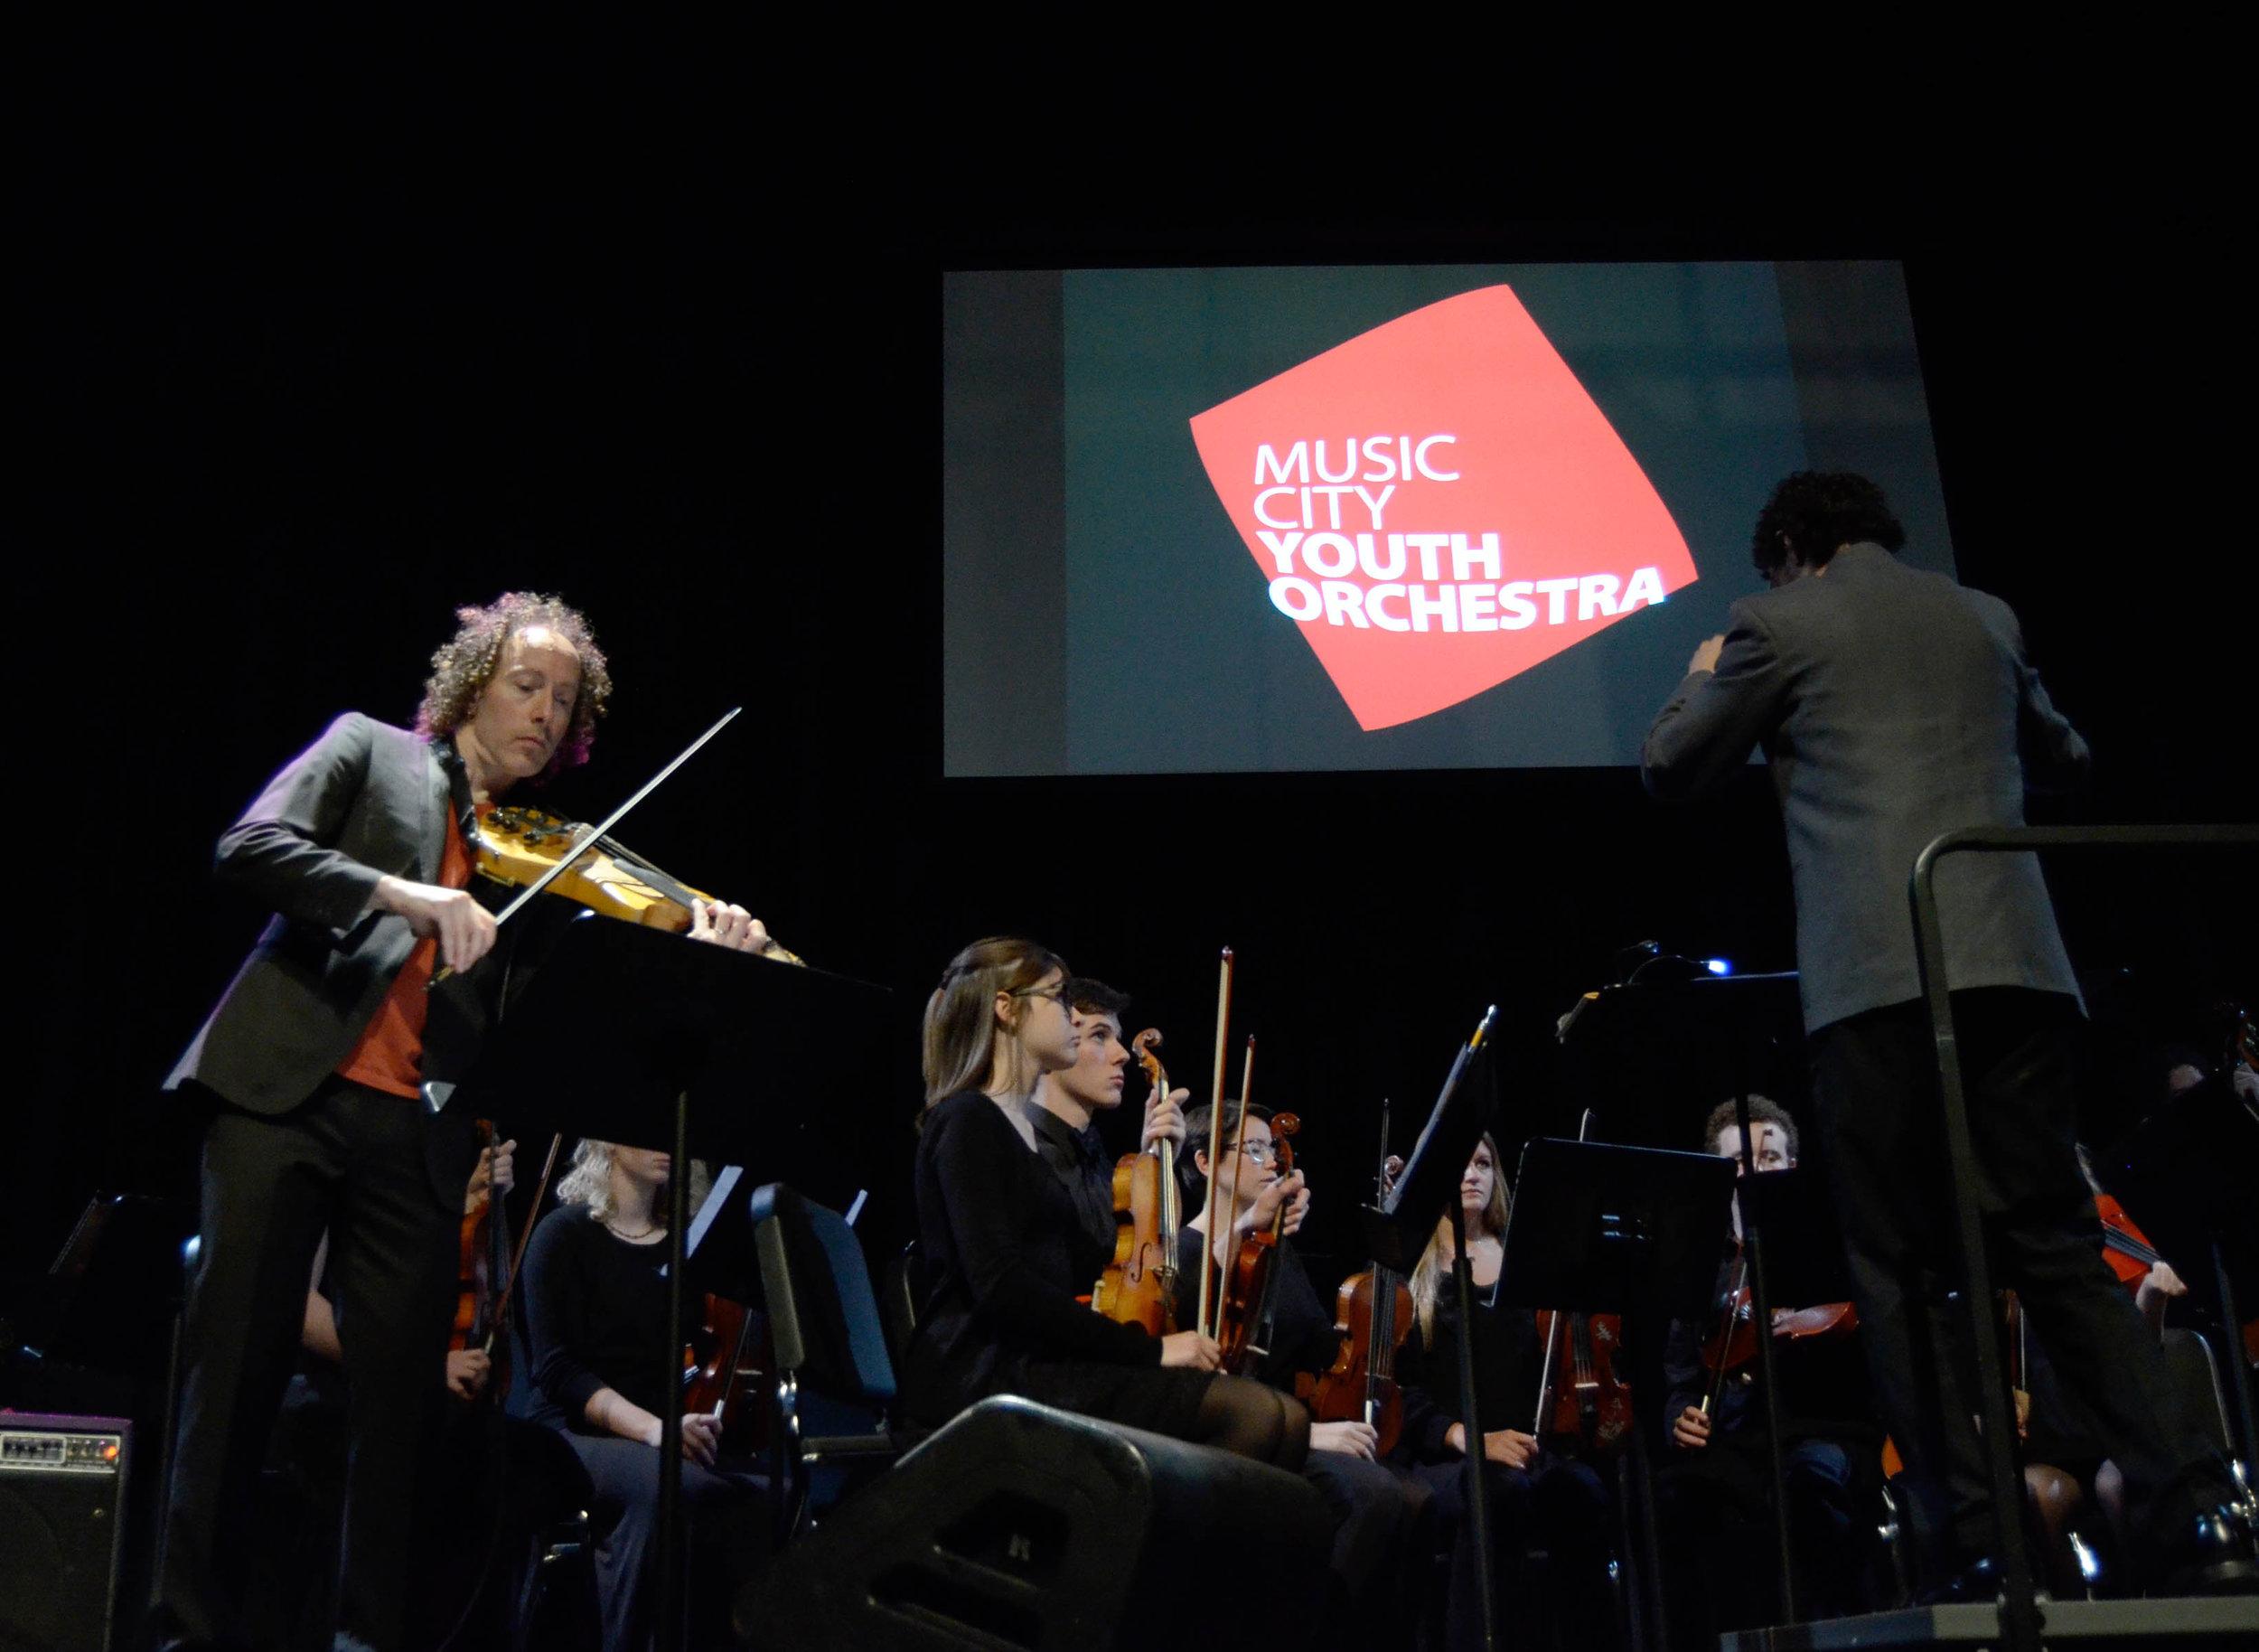 Music City Youth Orchestra 8K.jpg